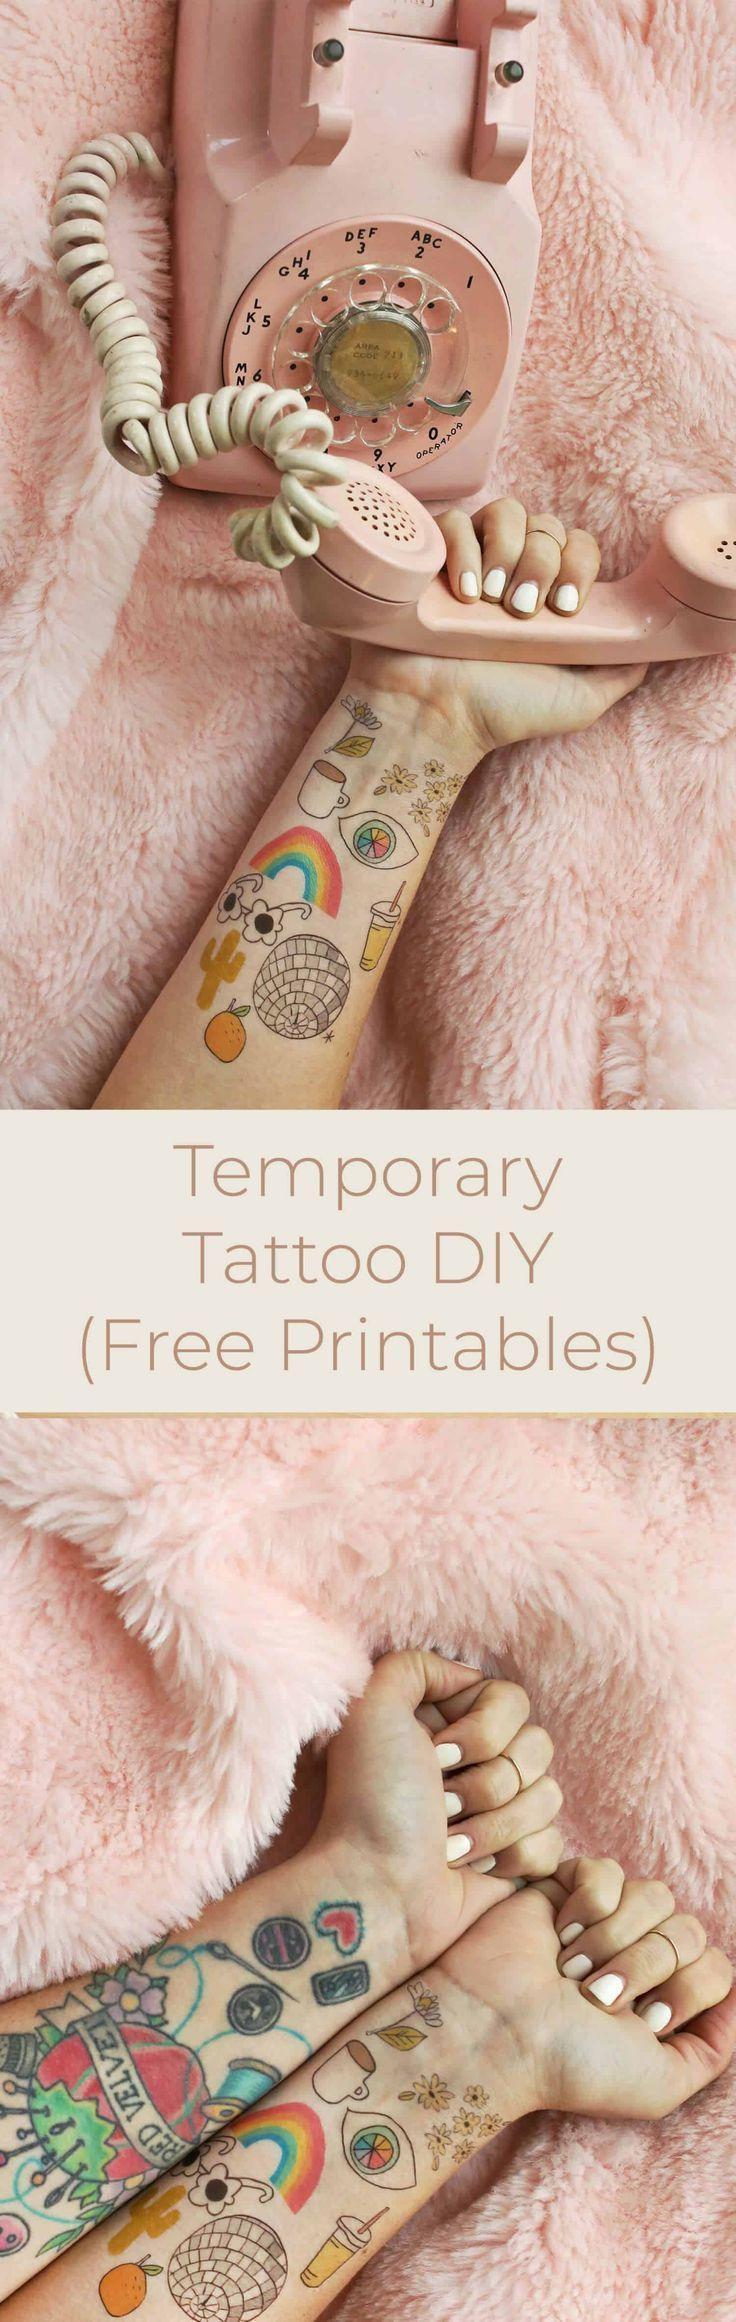 How to Make Temporary Tattoos   #  #TATTOOS #TemporarryTattooharrypotter #Tempor…  – Temporare Tattoos